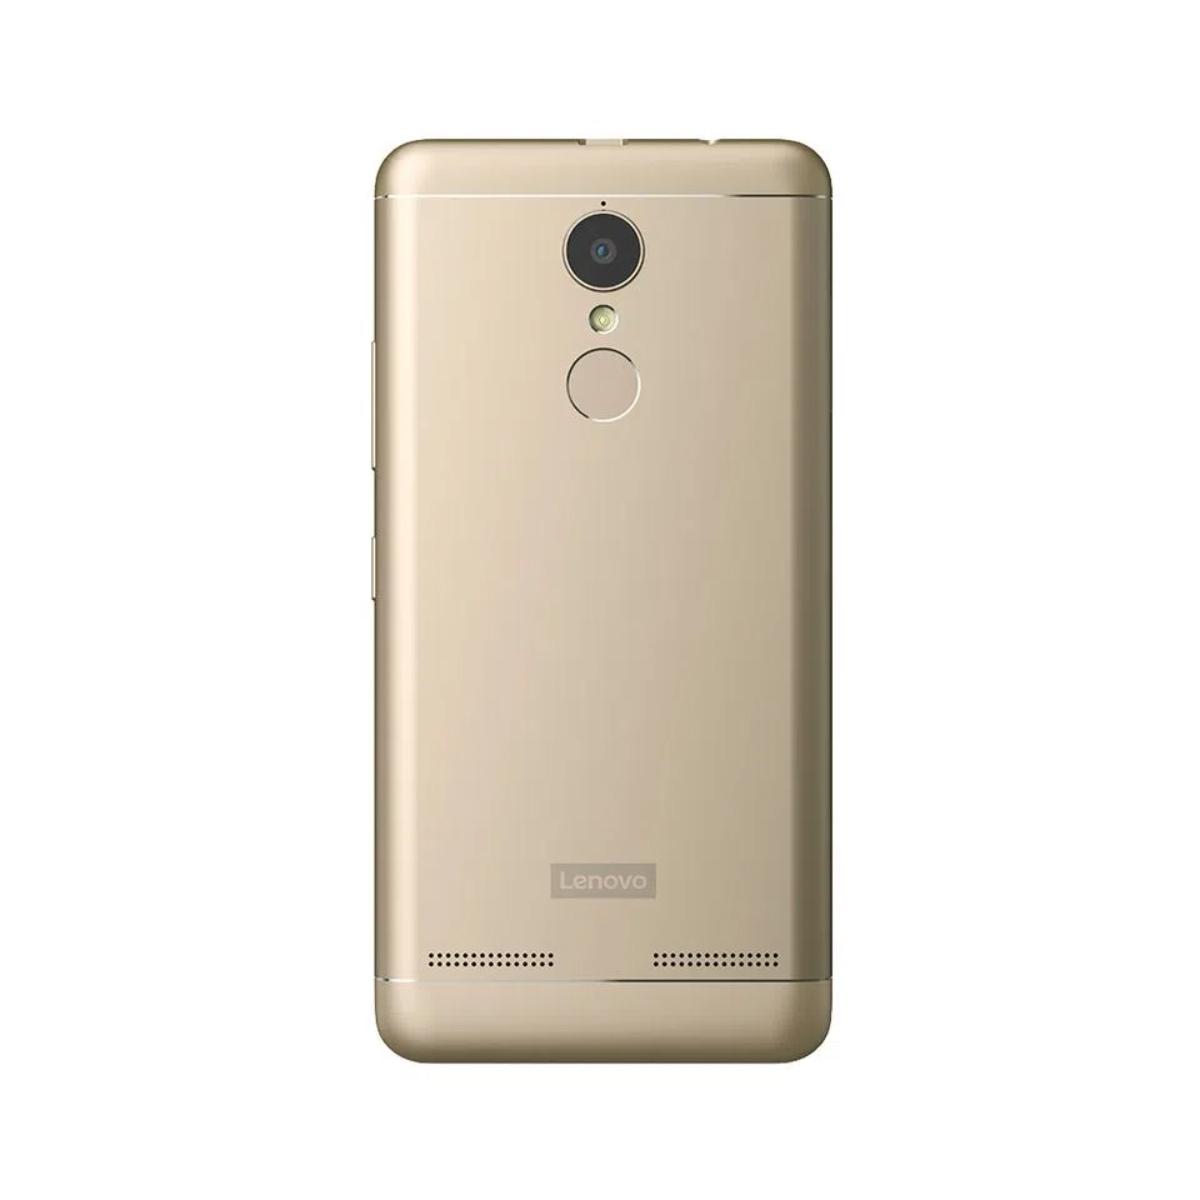 Lenovo Vibe K6 Dual 32gb Tela 5' Android 6 - Mostruário